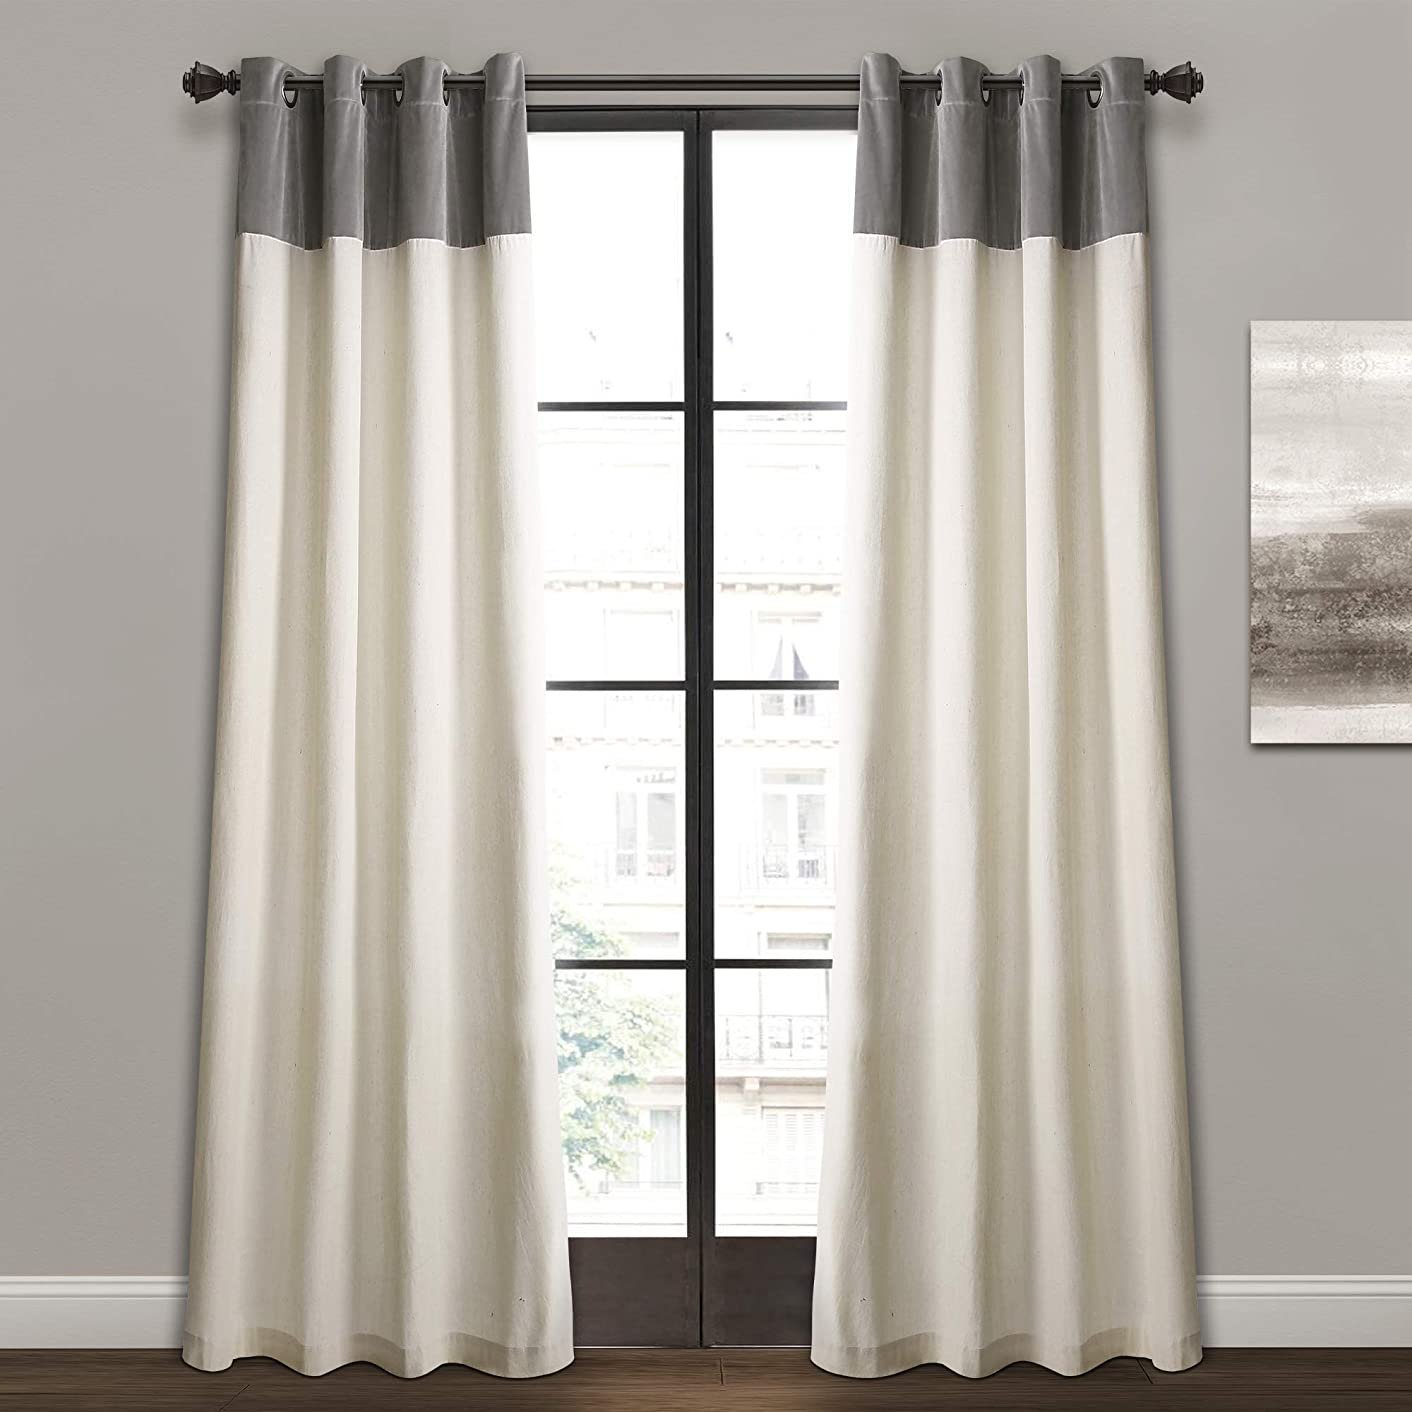 Lush Decor Milo Linen Window Curtain Panel Pair, 84